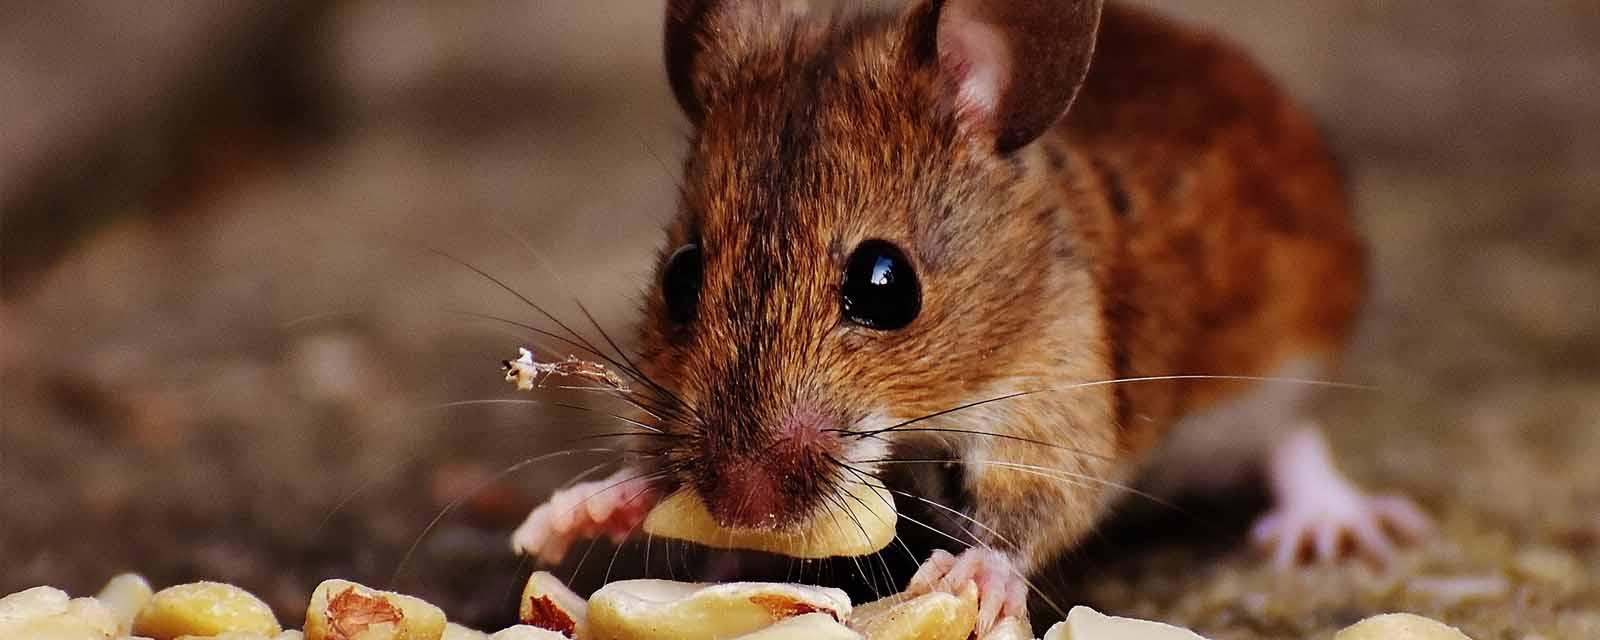 Mäusefutter kaufen